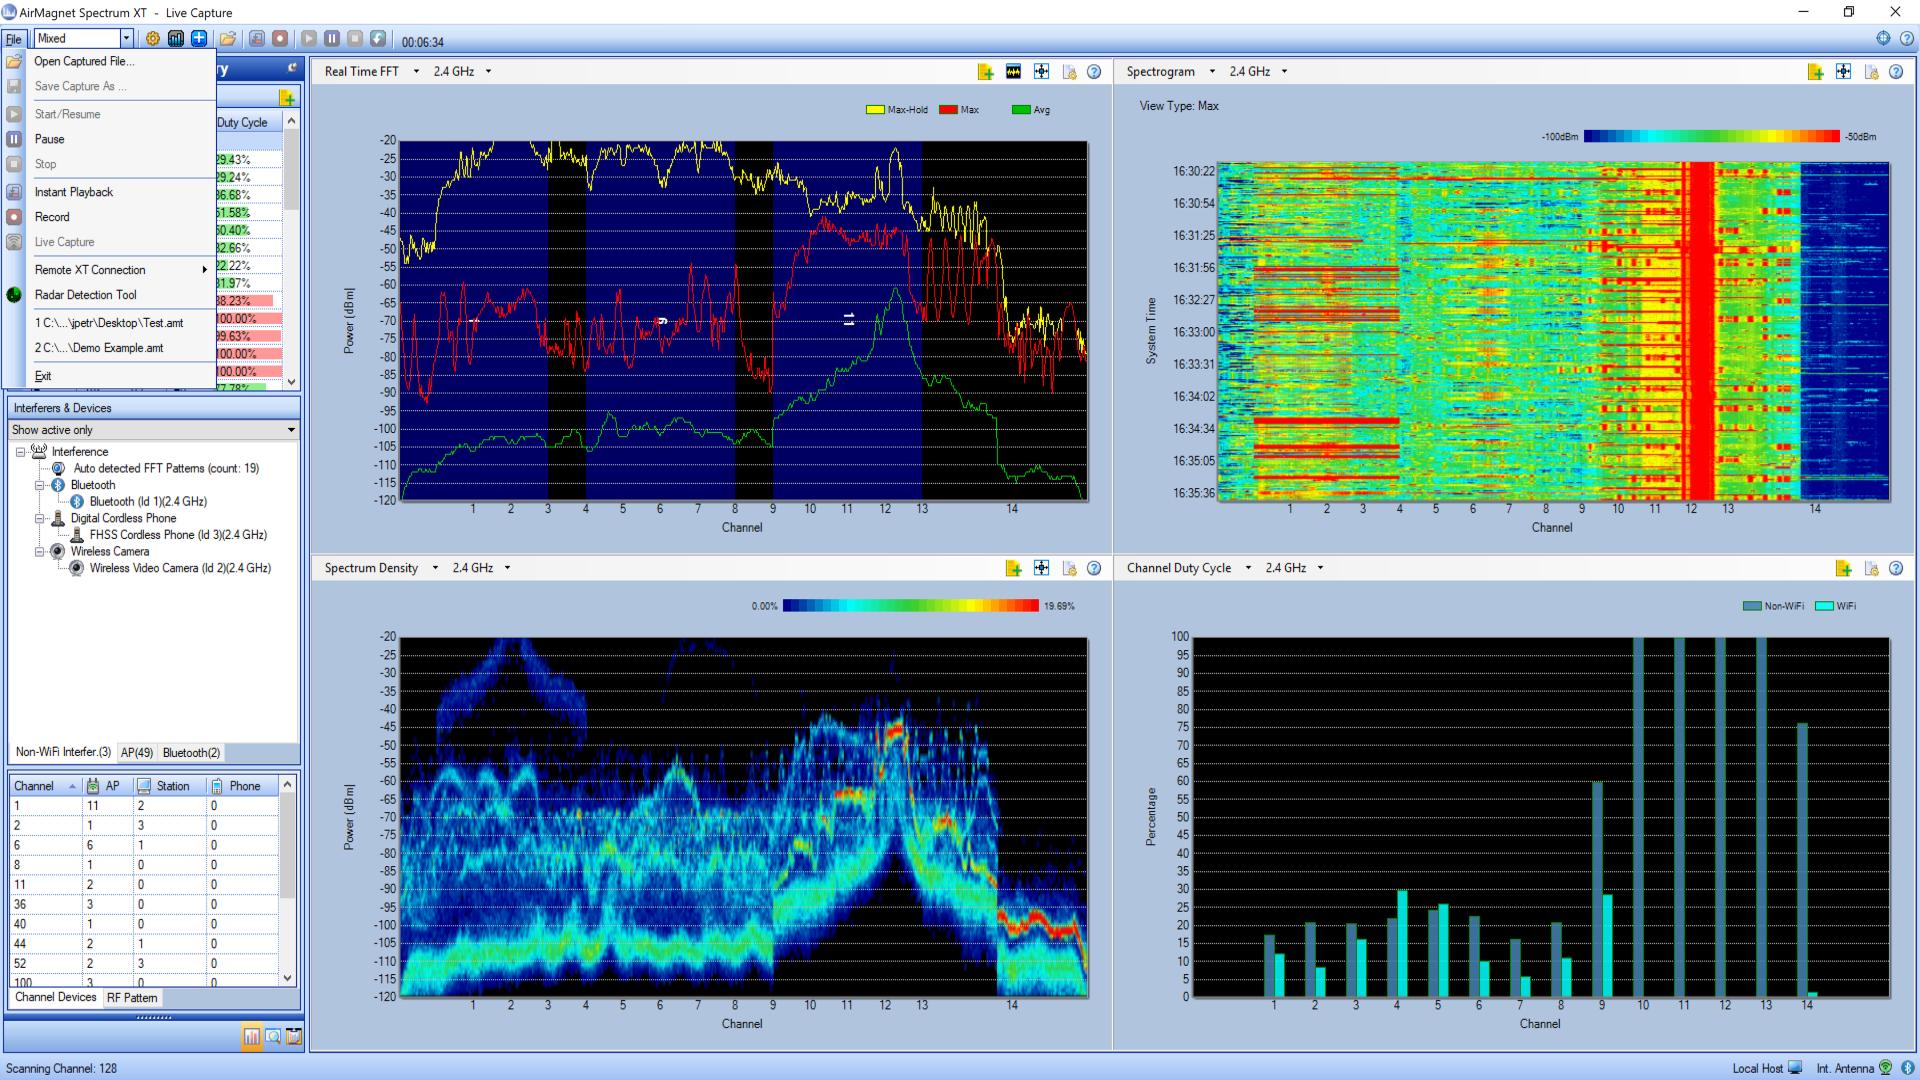 AirMagnet Spectrum XT